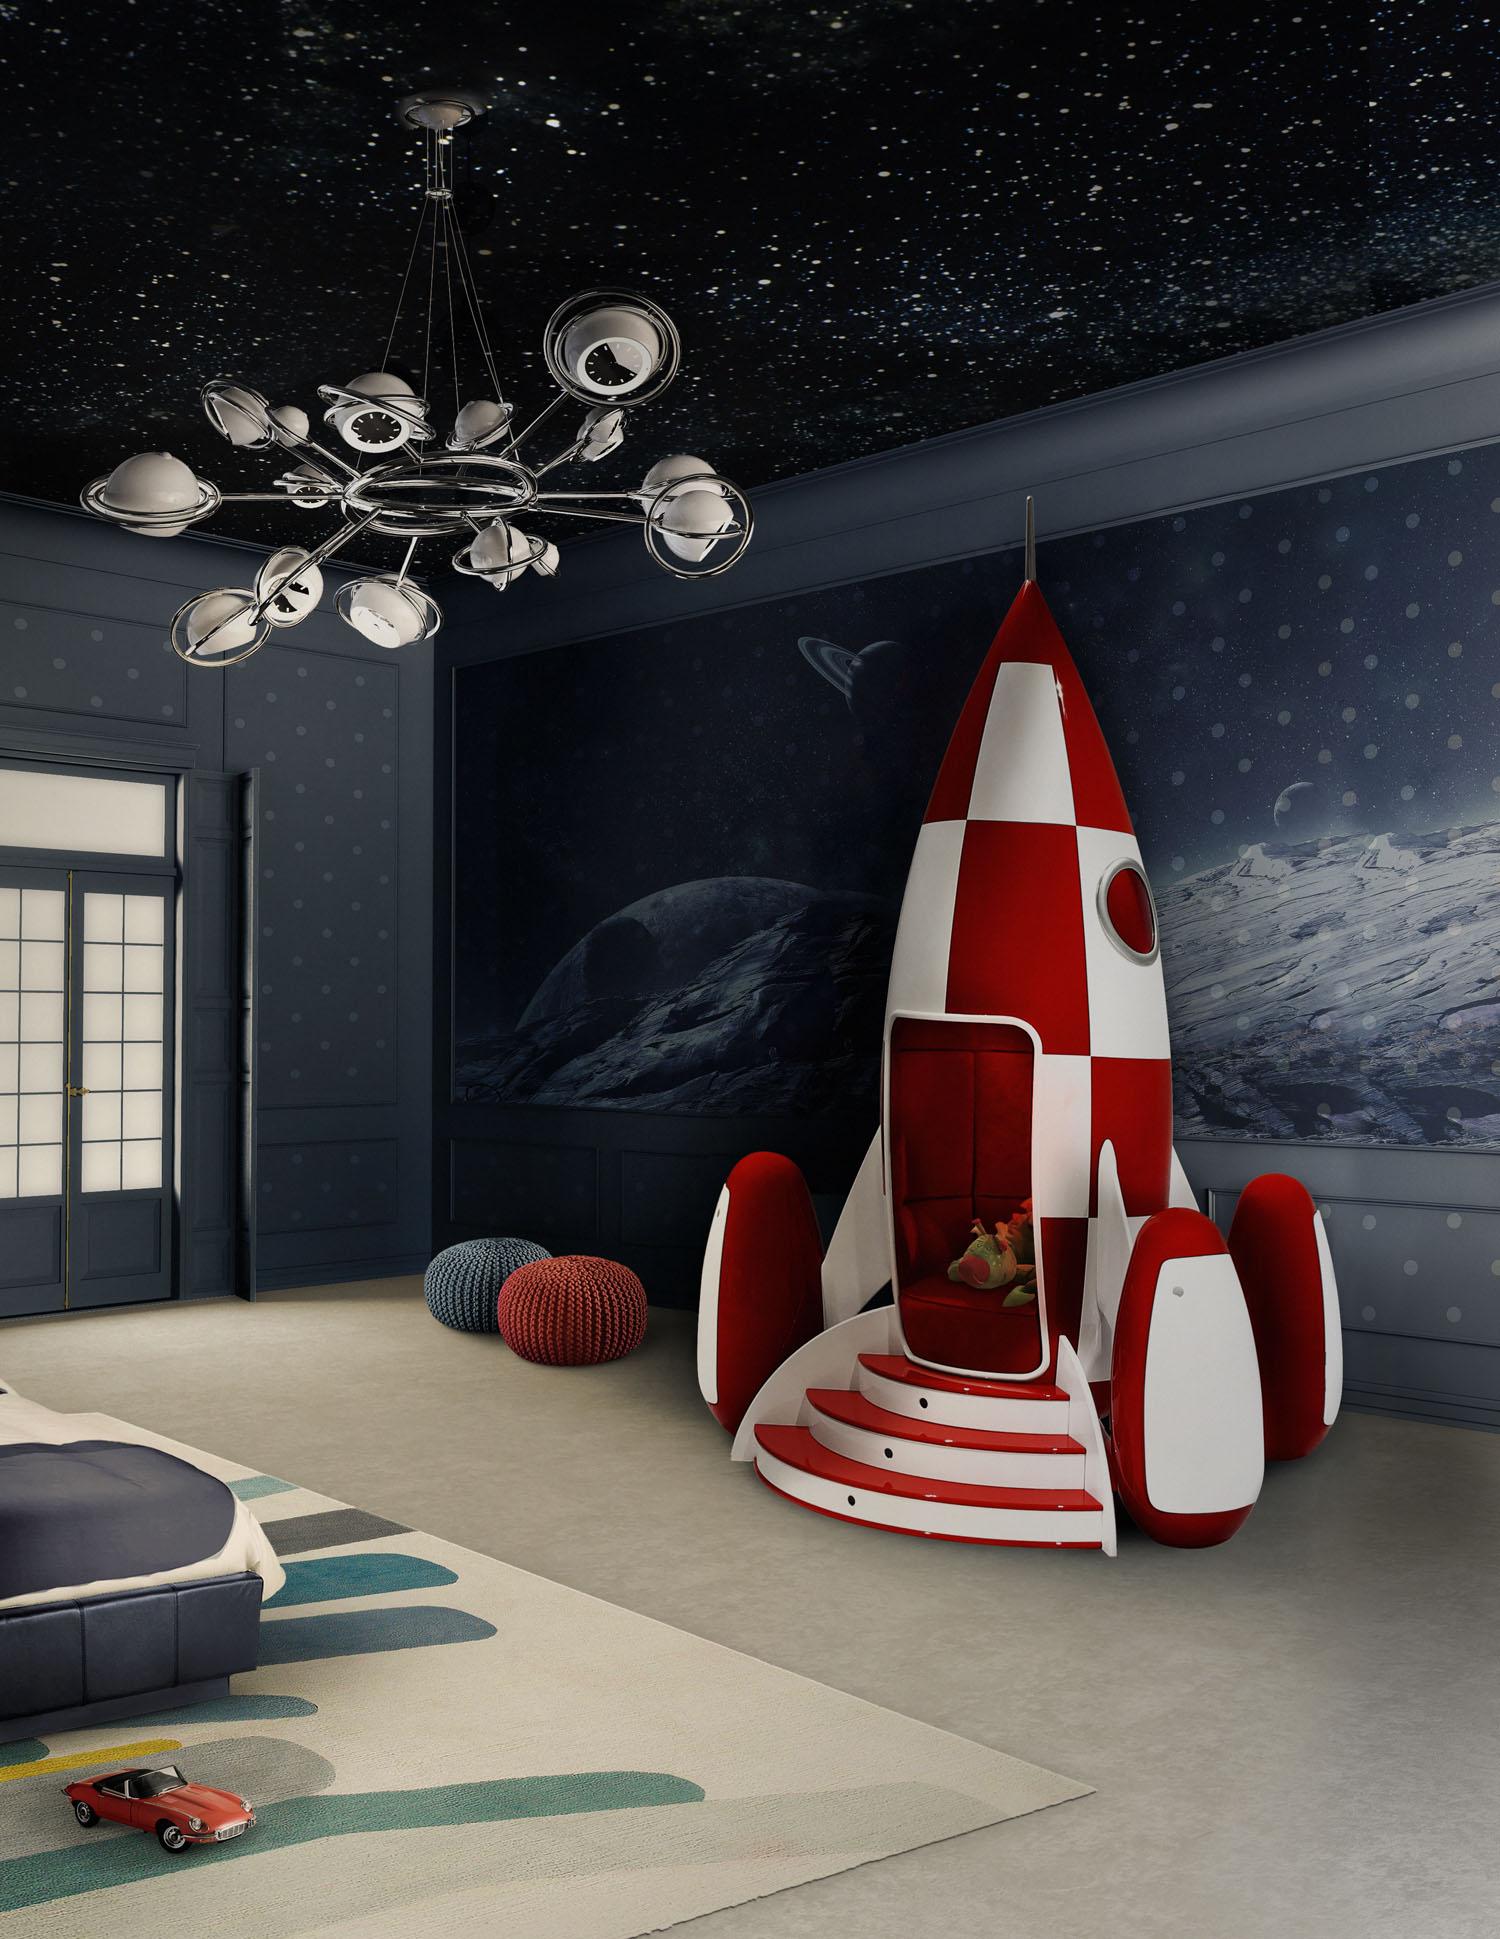 rocky-rocket-ambiance-circu-magical-furniture-jpg